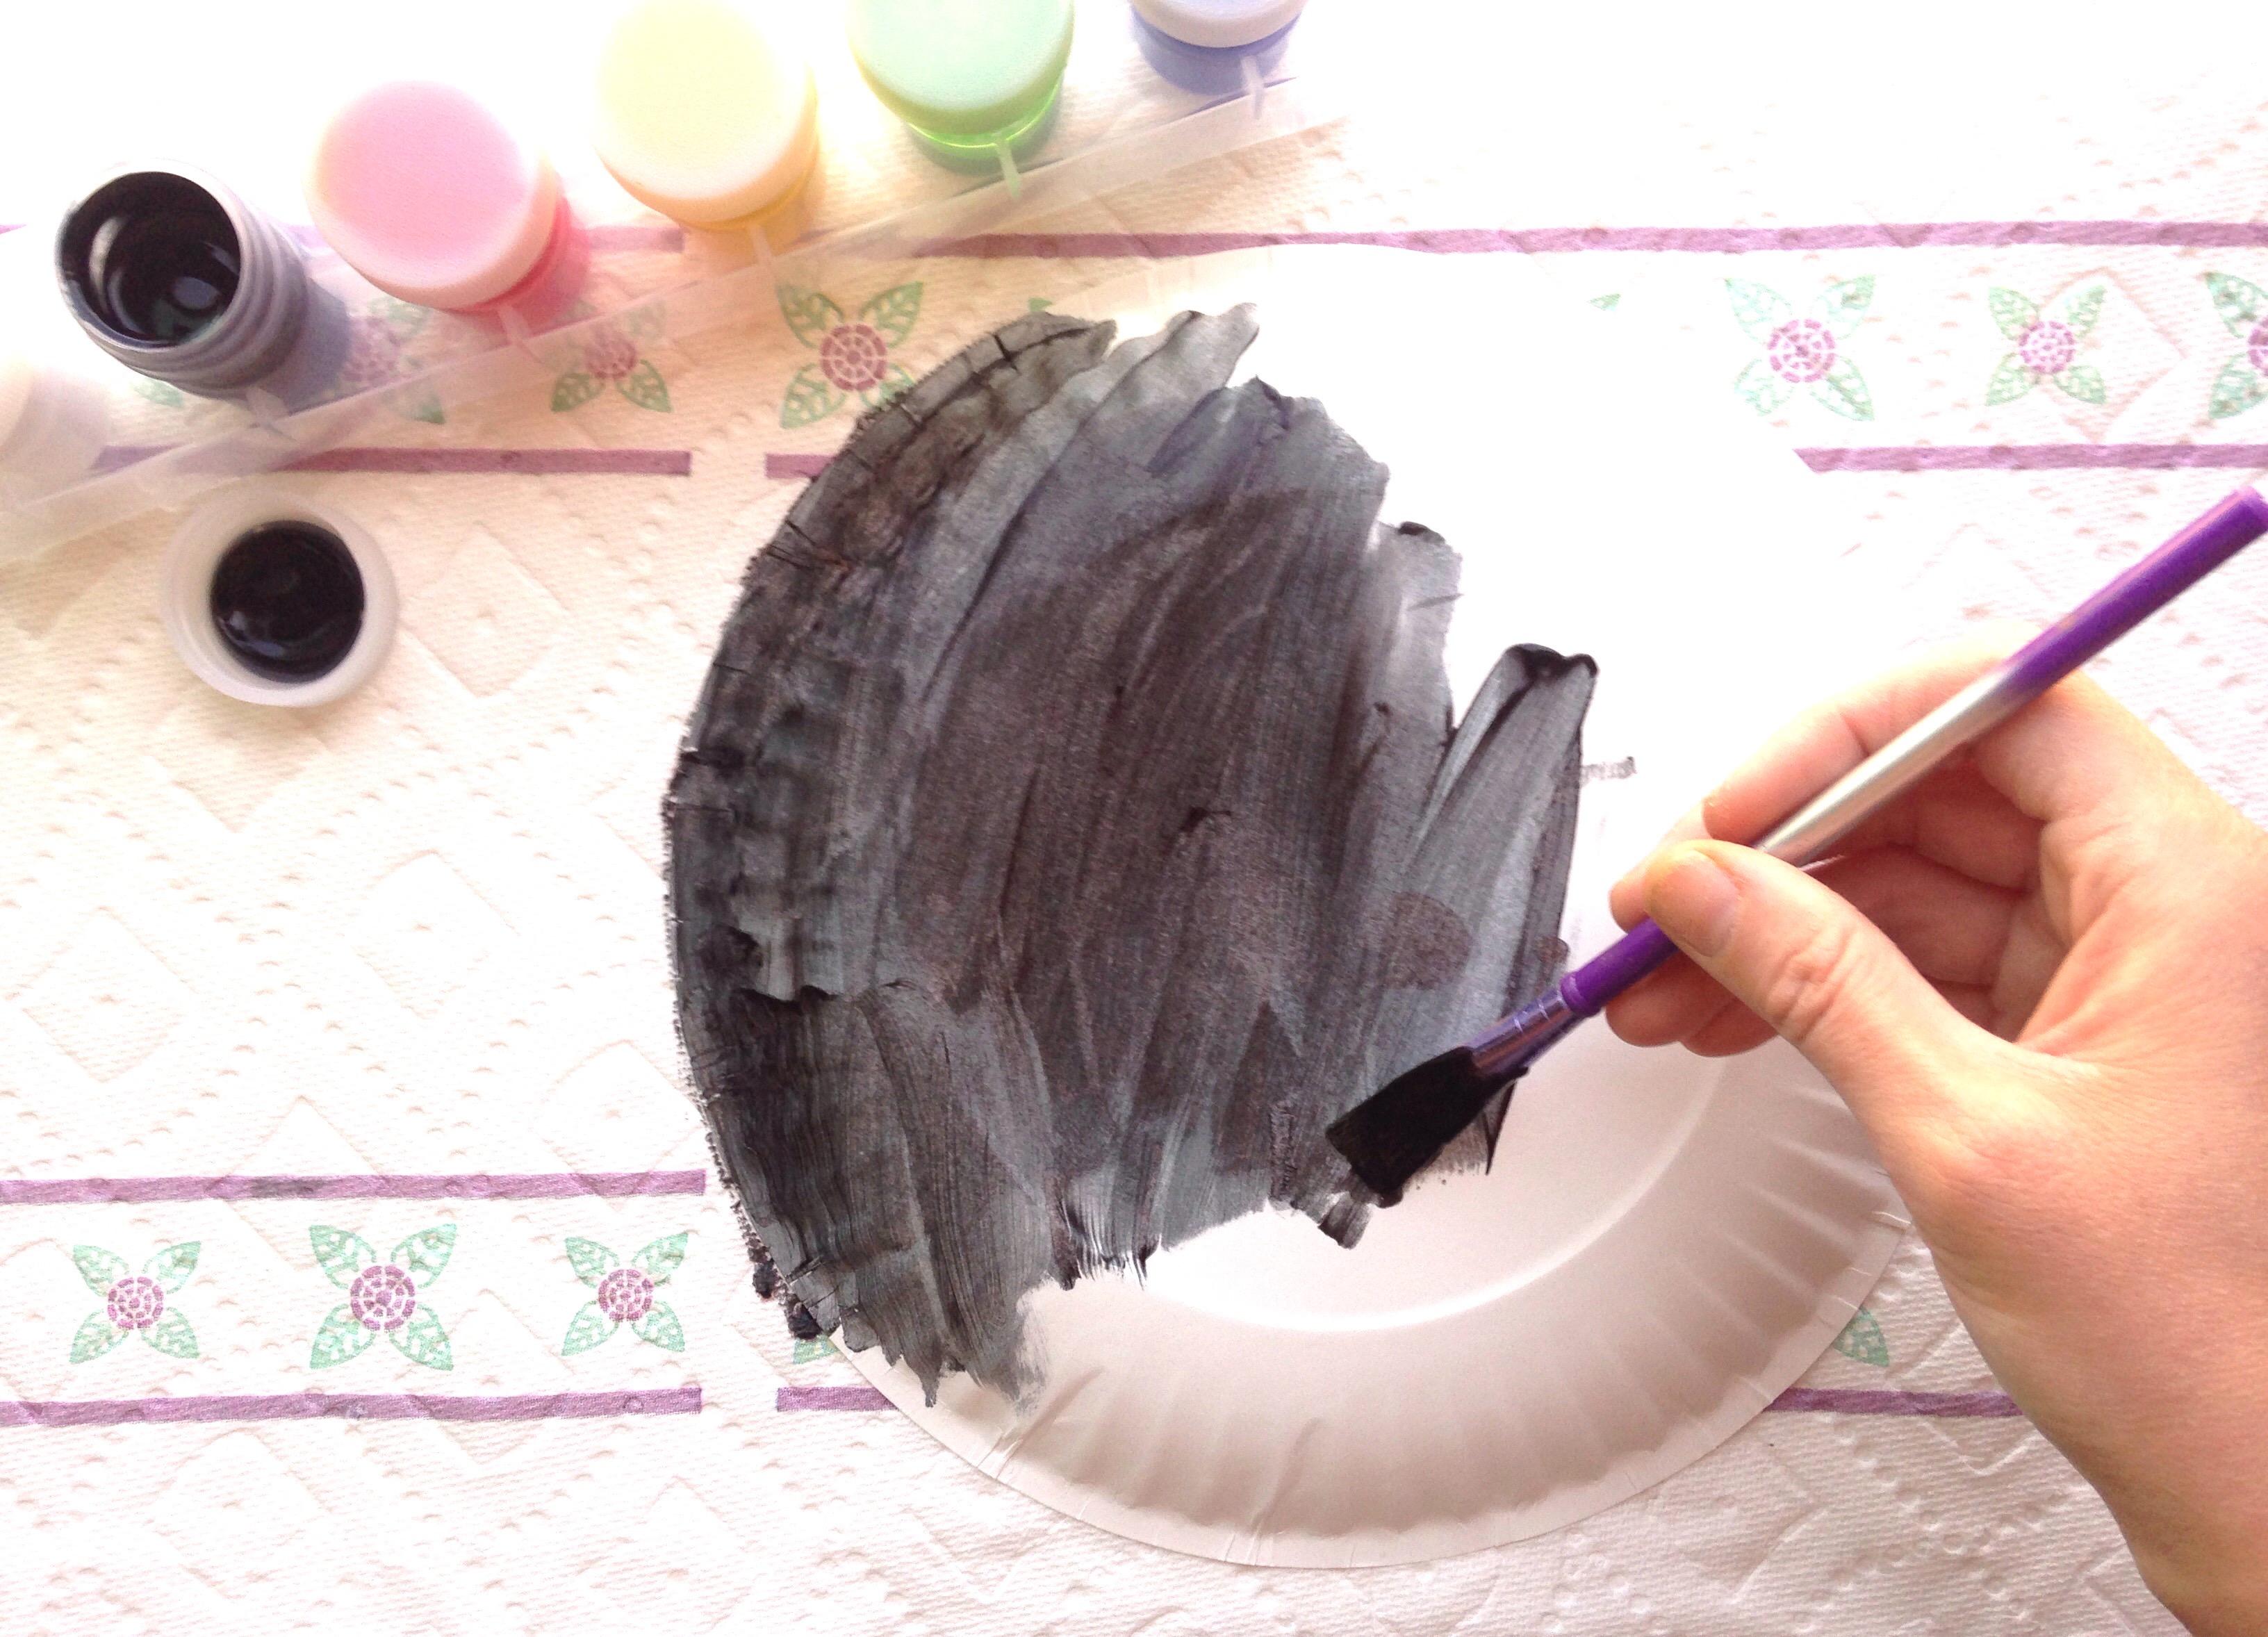 Paper Plate Crafts | Spring Crafts for Kids | Paper Plate Crafts for Toddlers | Paper & Ladybug Paper Plate Craft for Kids + Free Printable Template!_2 ...